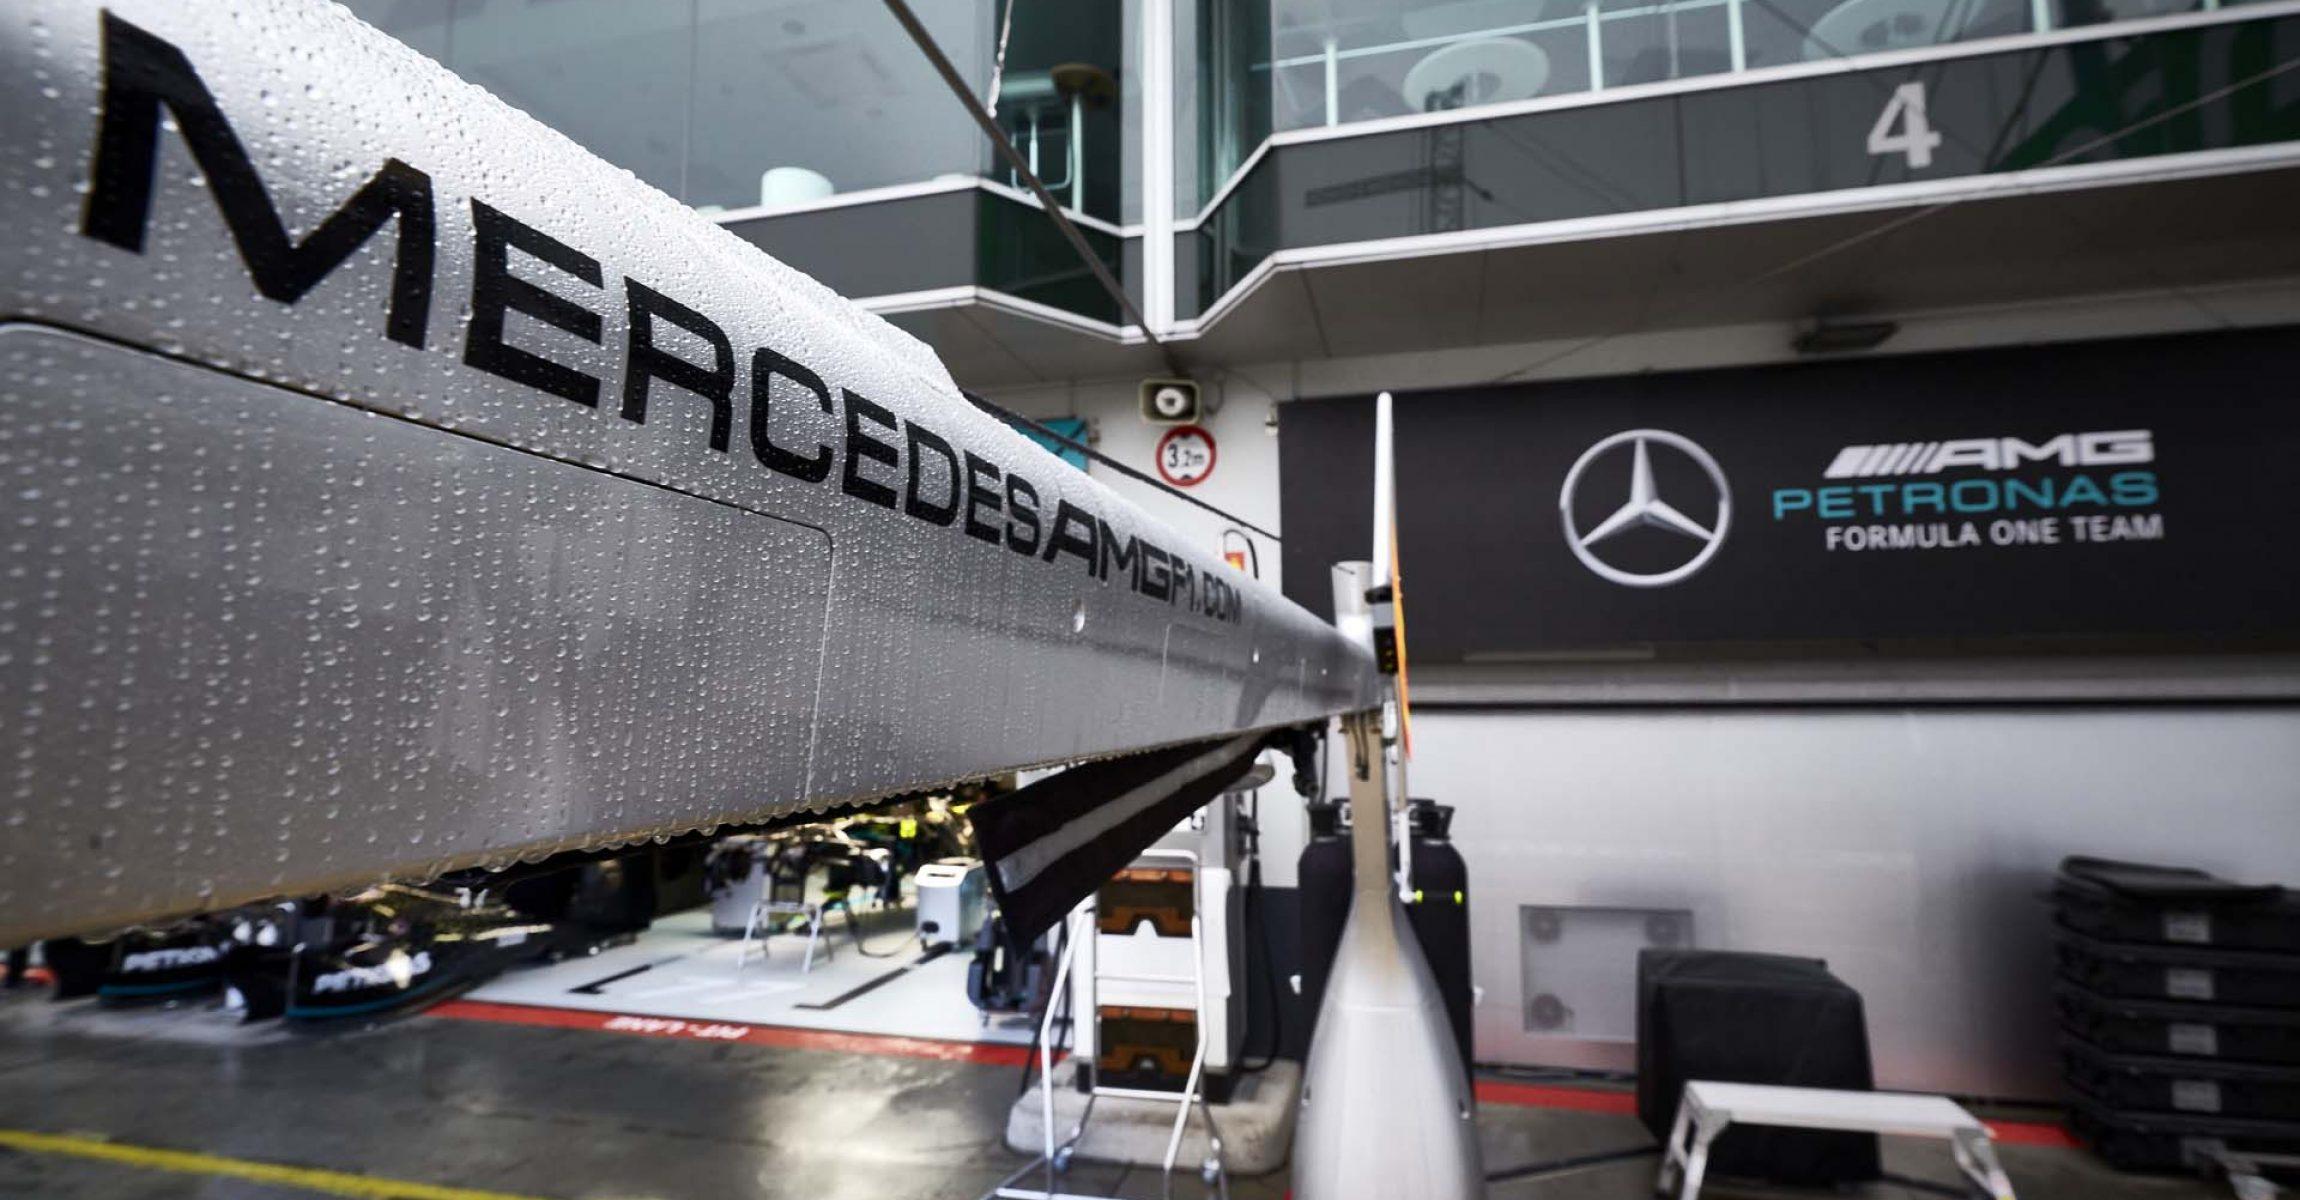 2020 Eifel Grand Prix, Thursday - Steve Etherington Mercedes AMG Petronas Formula One Team logo